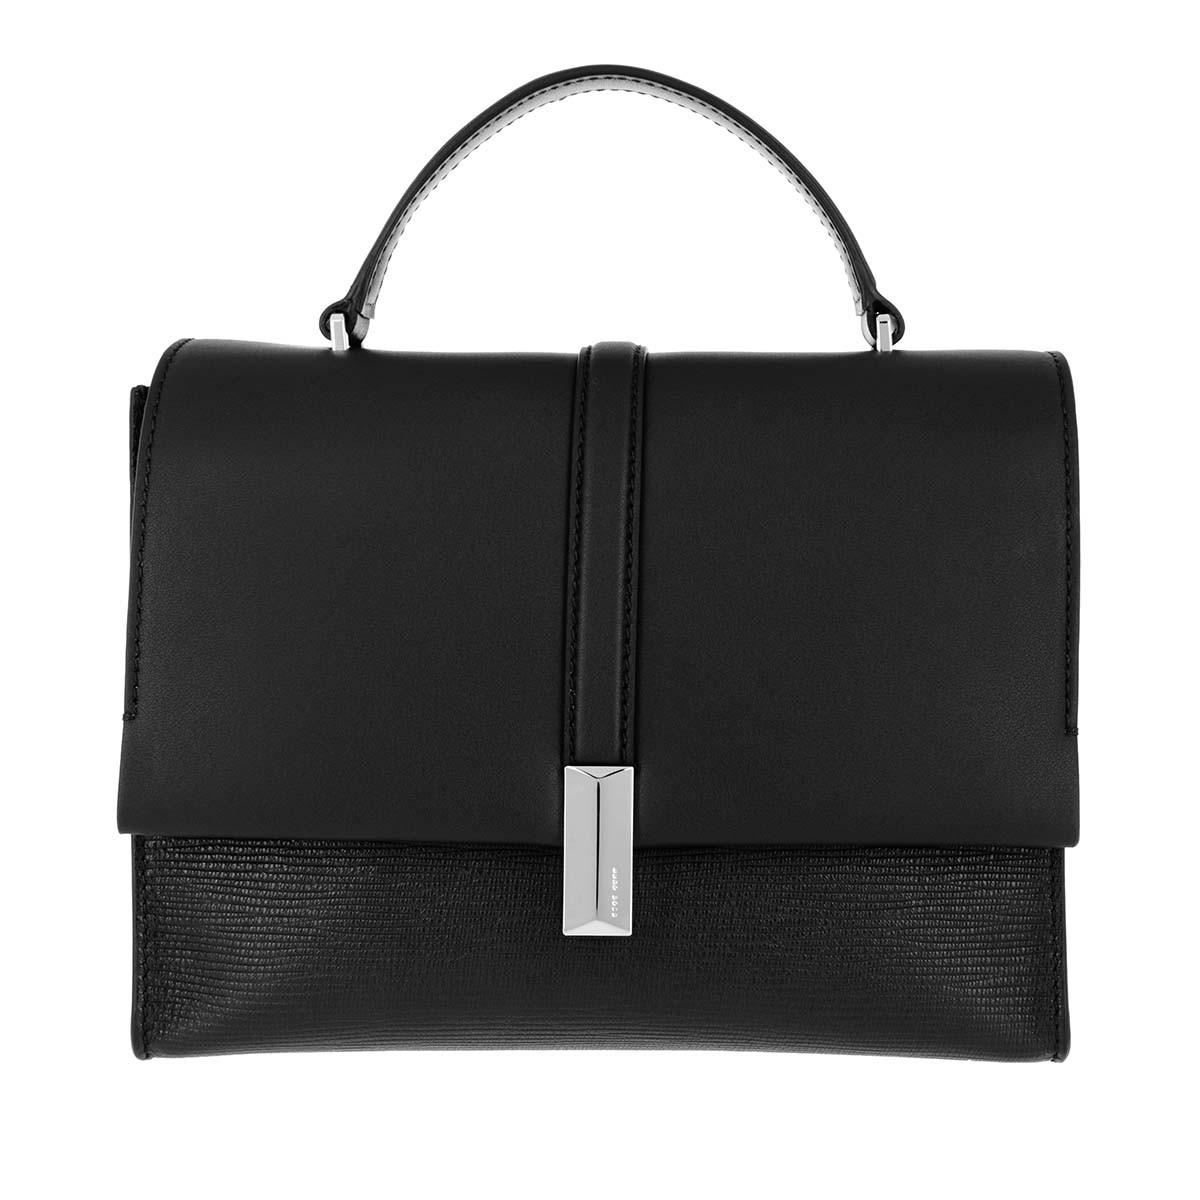 Boss Satchel Bag - Nathalie Top Handle Bag Black - in schwarz - für Damen